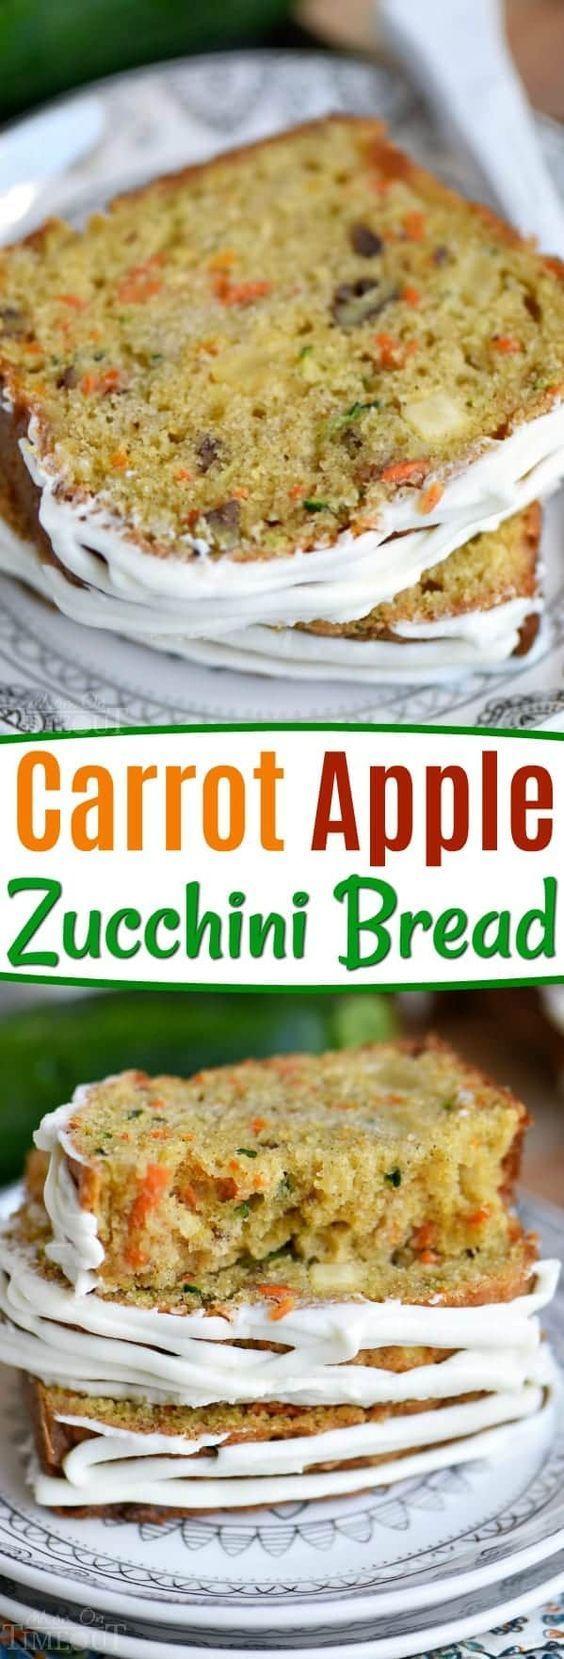 ThisCarrot Apple Zucchini Breadrecipe is incre…